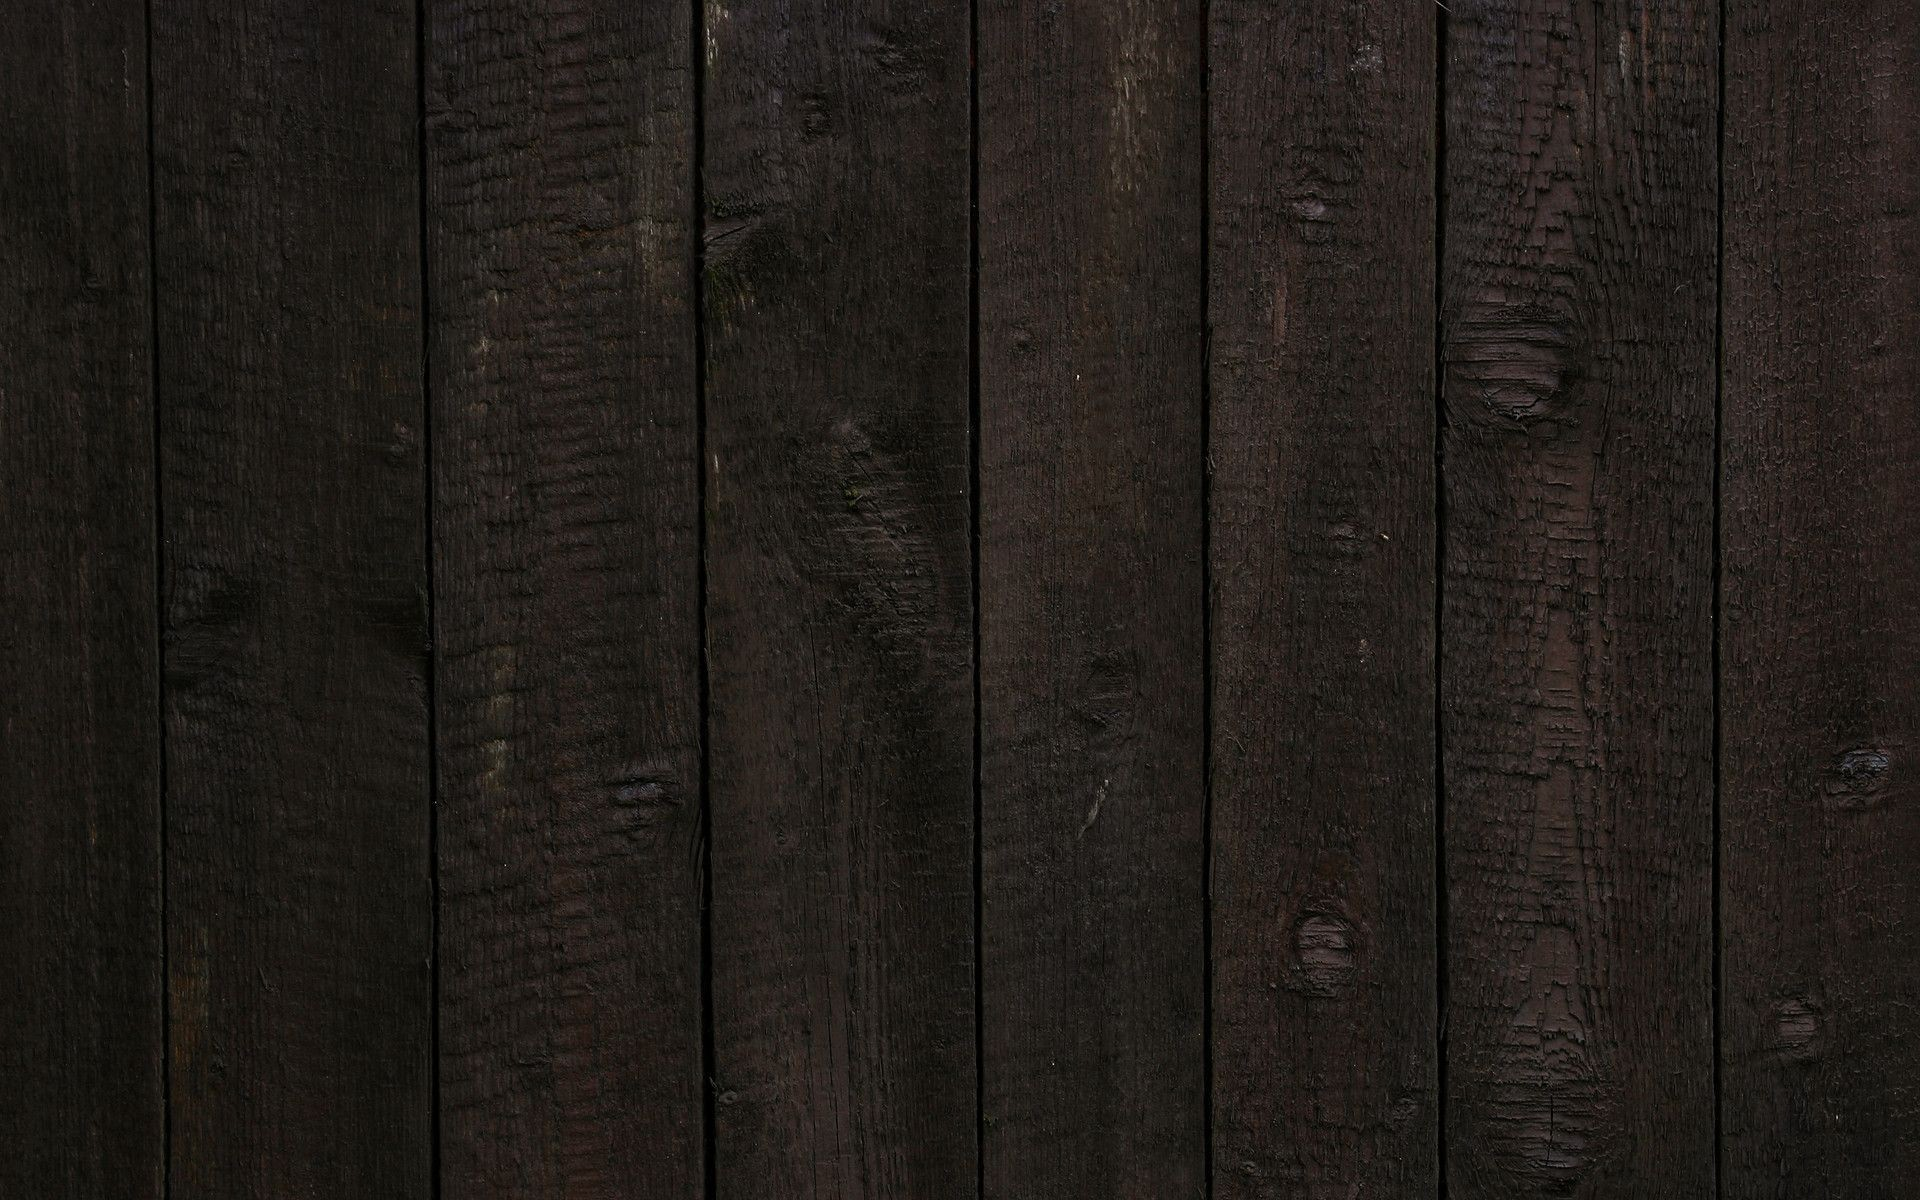 Dark Wood Wallpapers Wallpaper Cave Page Vertical Astek Wallcovering Woods.  room designing. designing a …